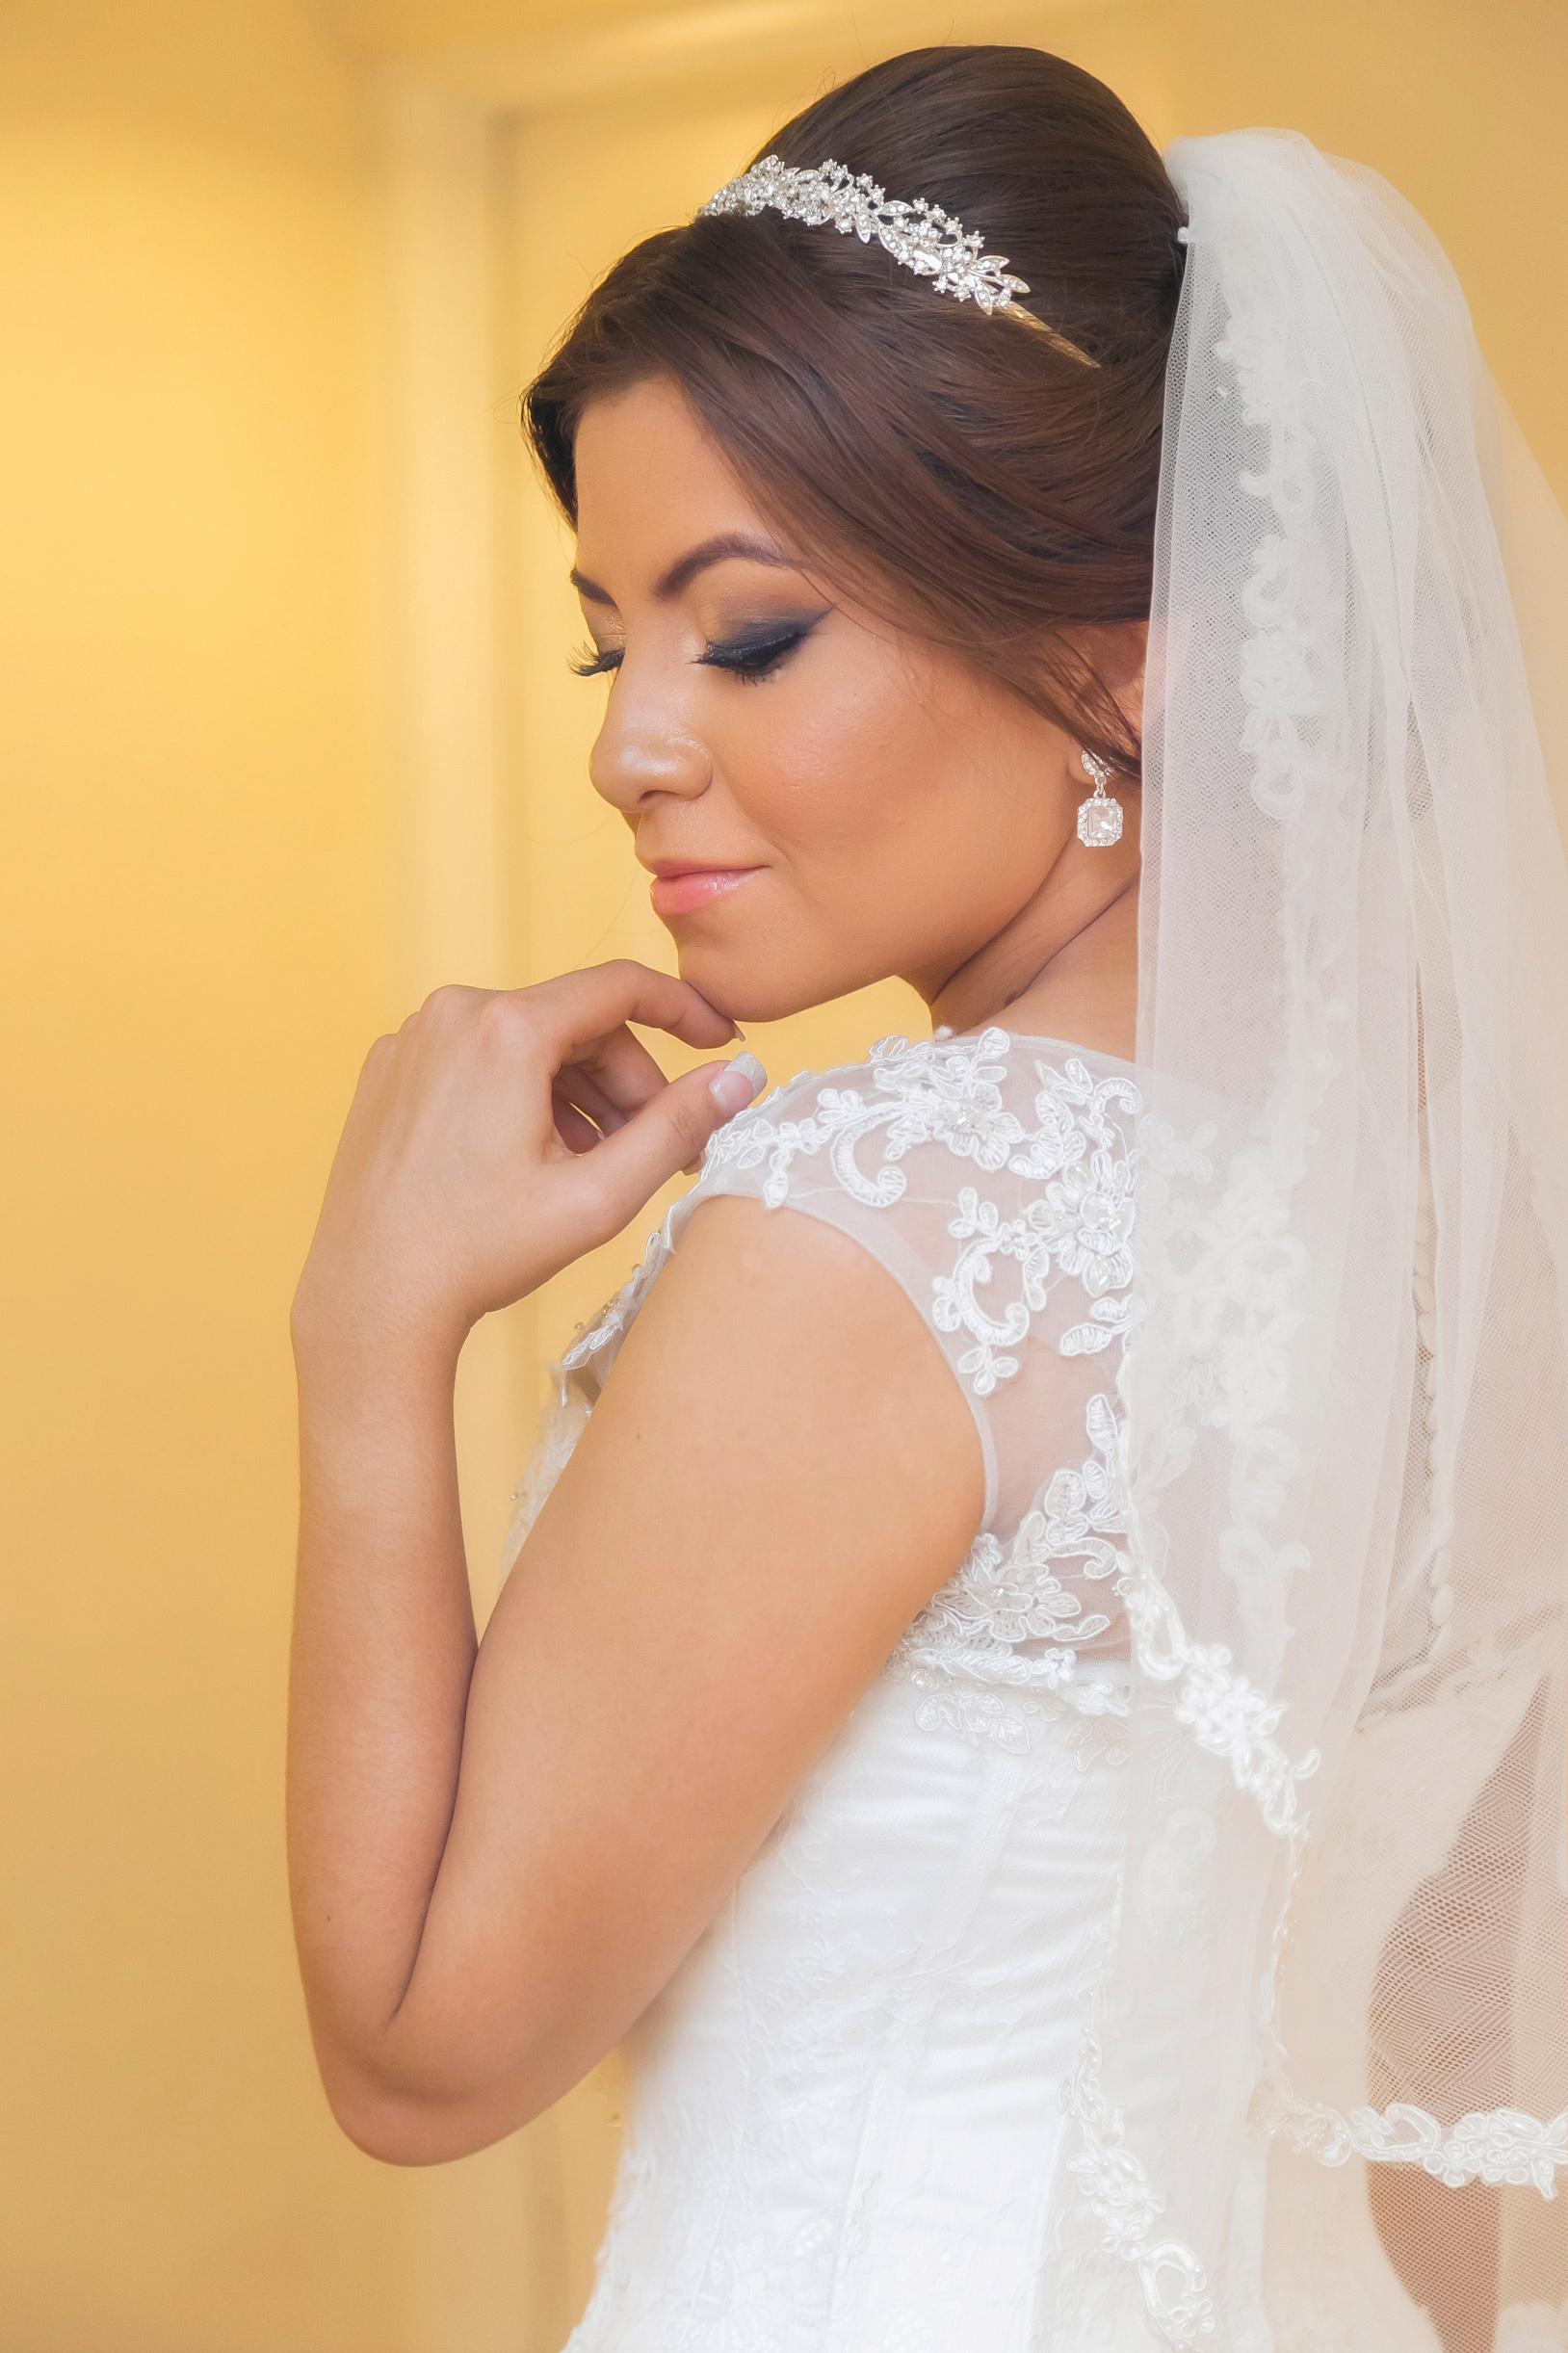 Mike_Mendez_Photography_Wedding_Engagements_15